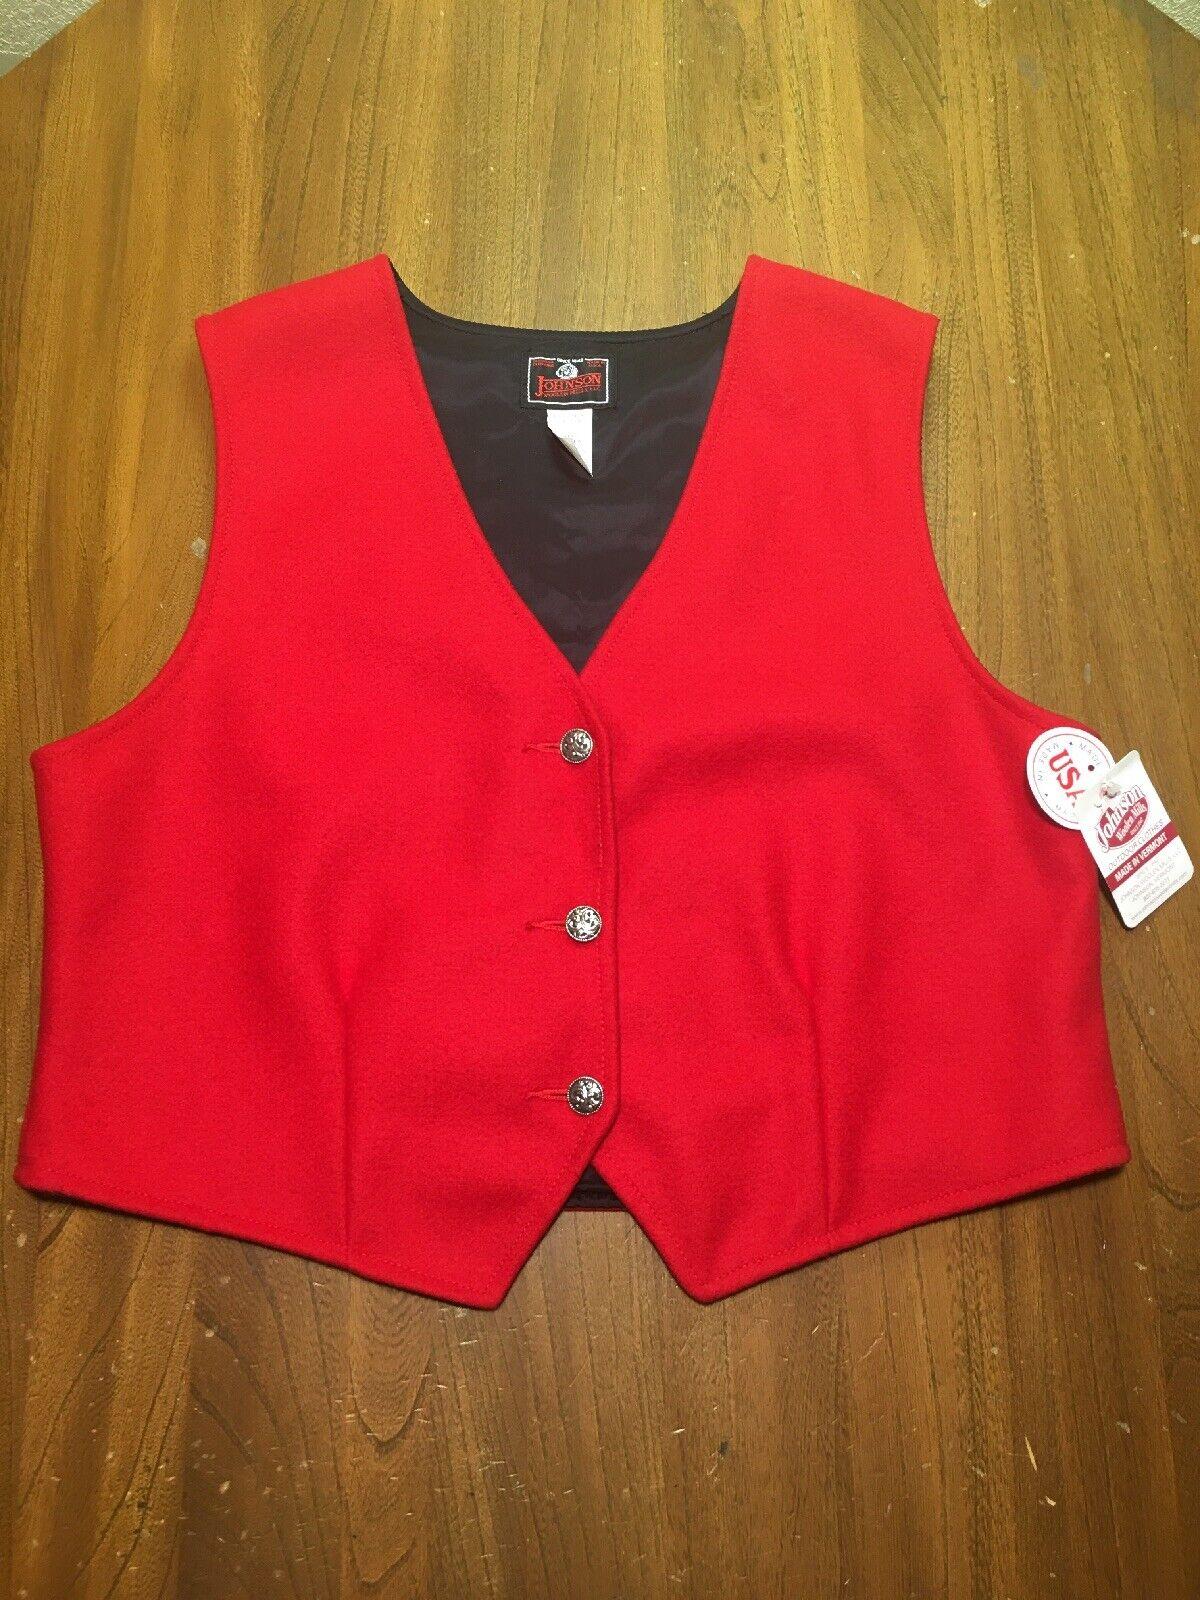 Johnson Woolen Woolen Woolen Mills Women's L Red Wool Blend Vest Made in USA  89 Retail ccb5cb